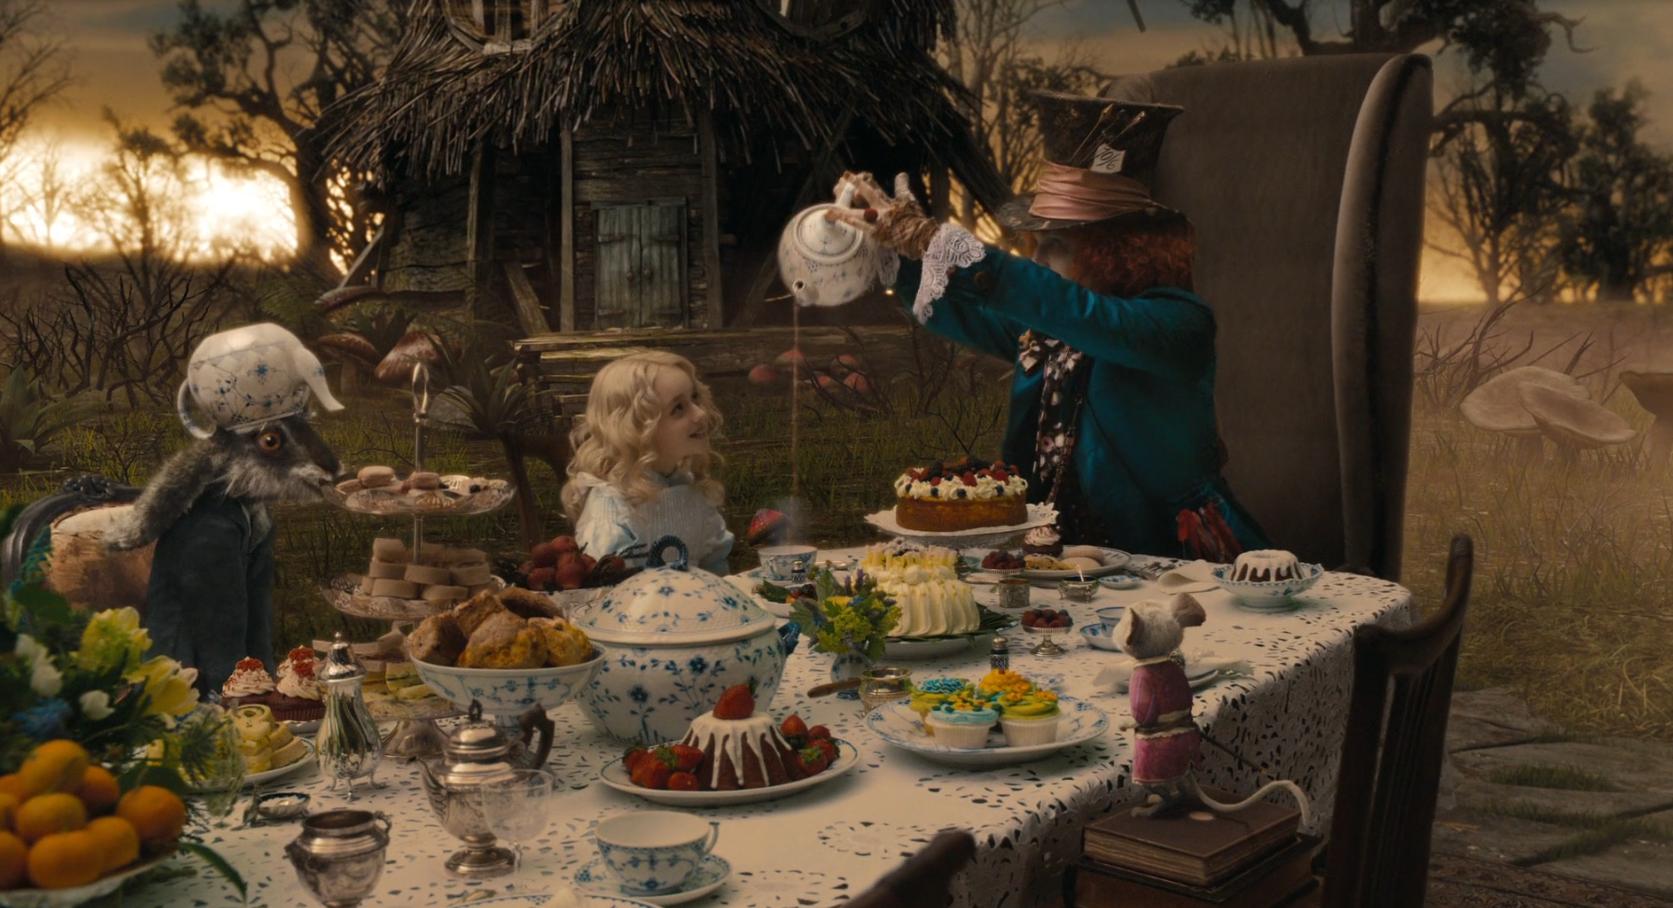 alice in wonderland desktop backgrounds #8